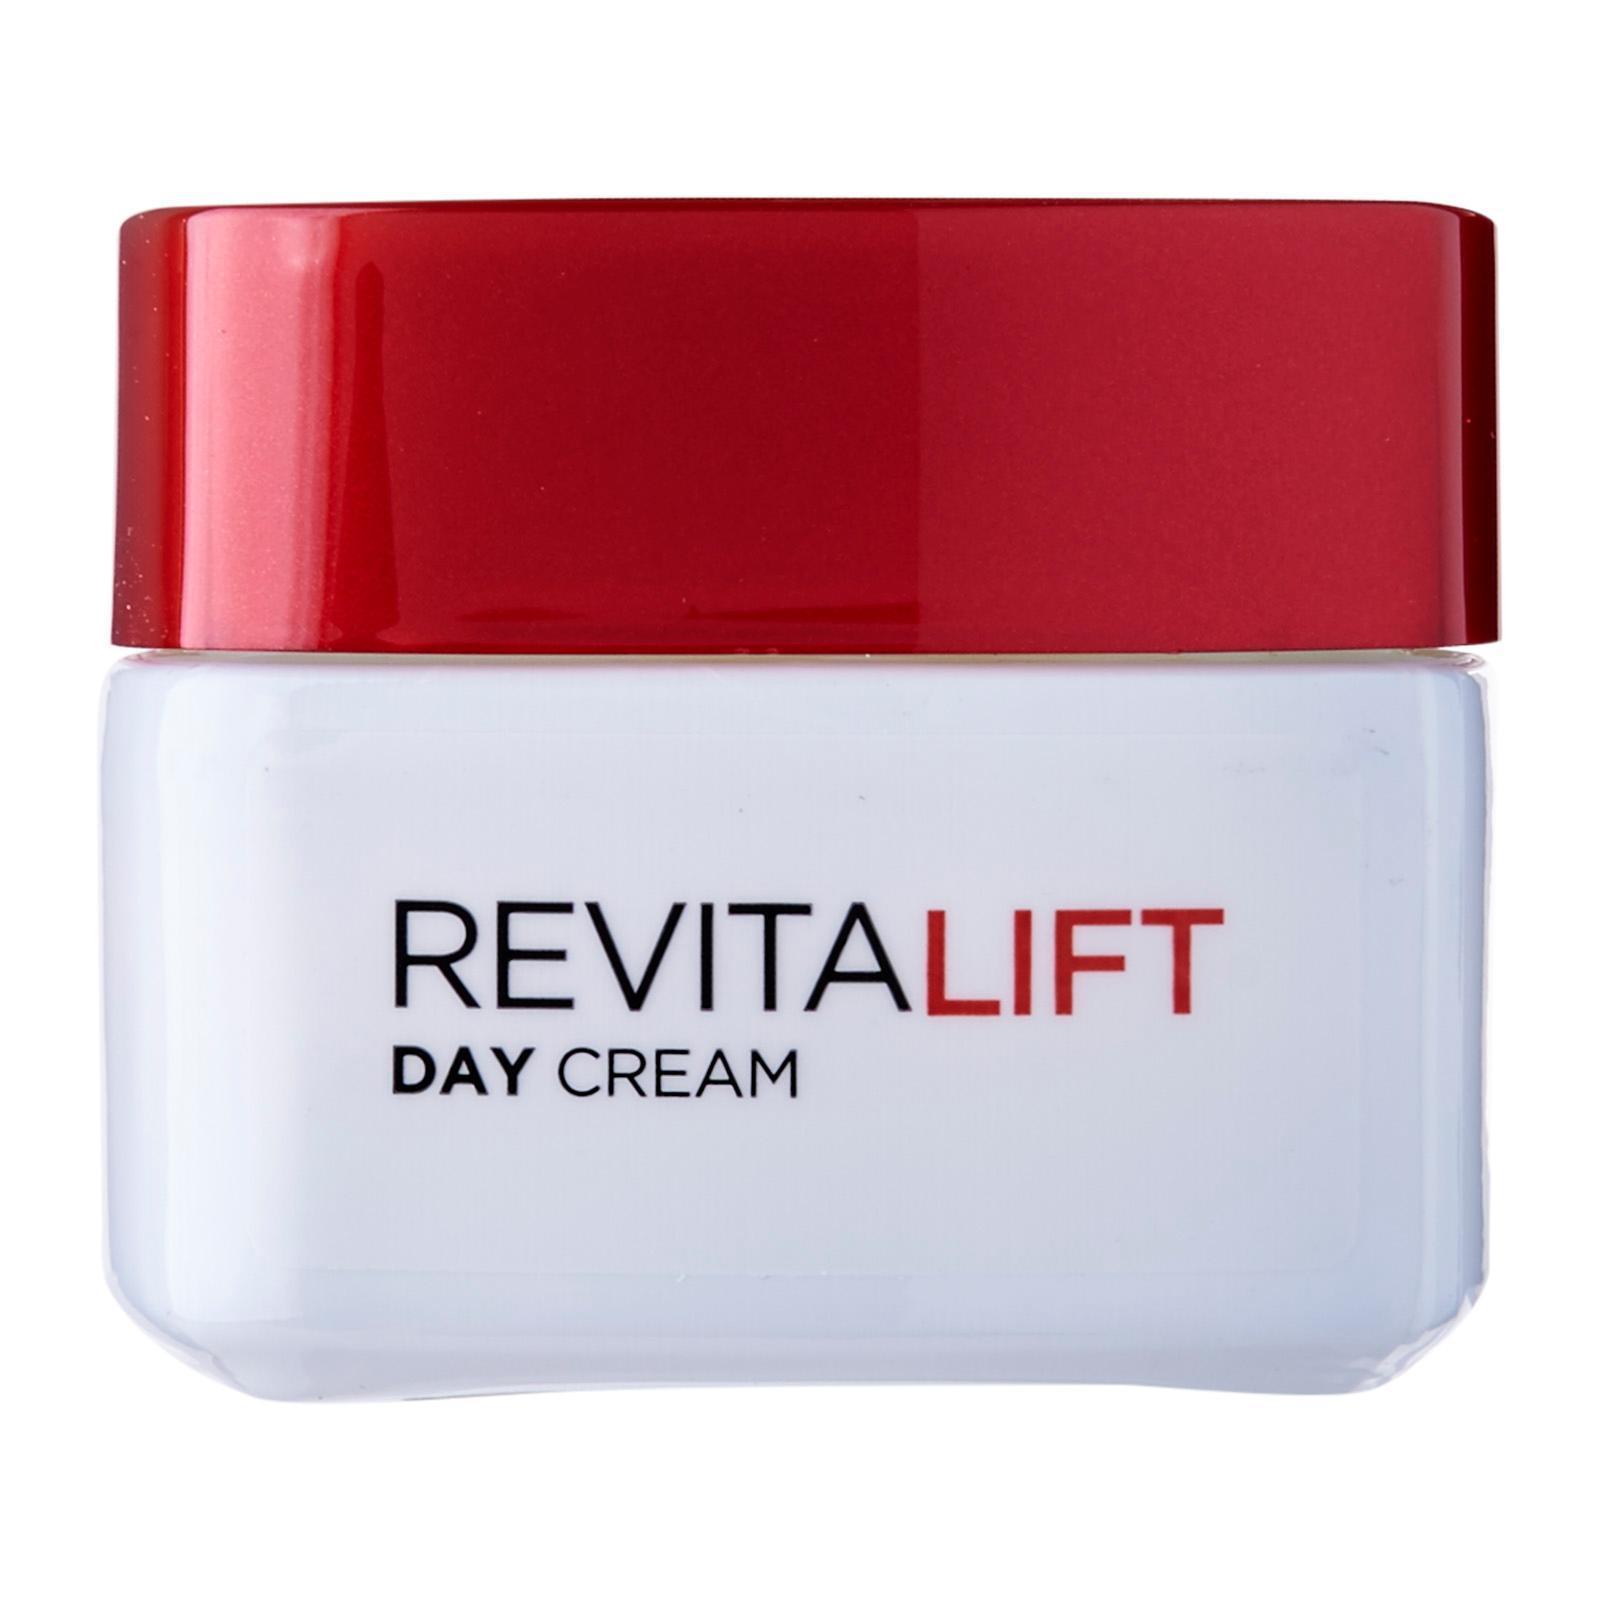 L'Oreal Paris Revitalift Dermalift Anti-Aging Day Cream SPF23 50ml